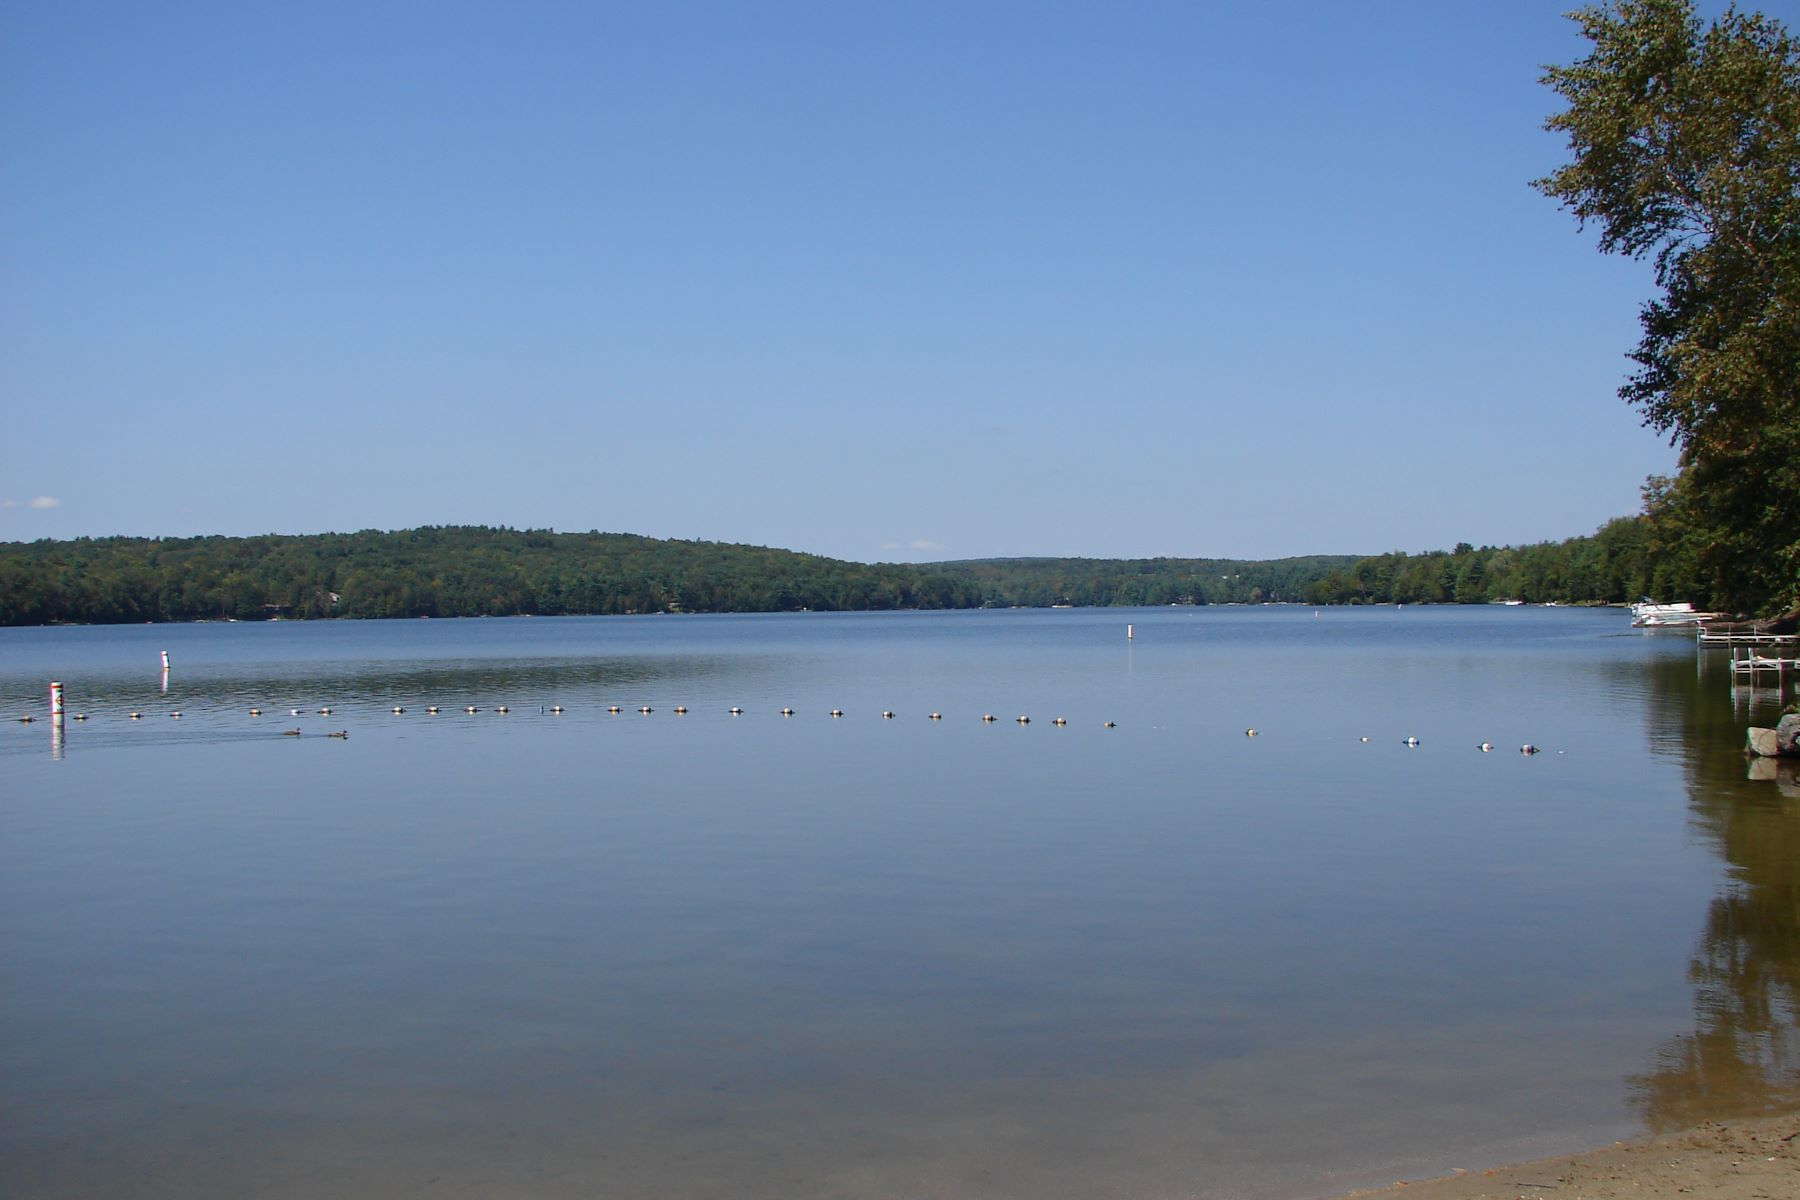 Land for Sale at Woodridge Lake Building Lot Lot 754 Cornwall Drive, Goshen, Connecticut, 06756 United States